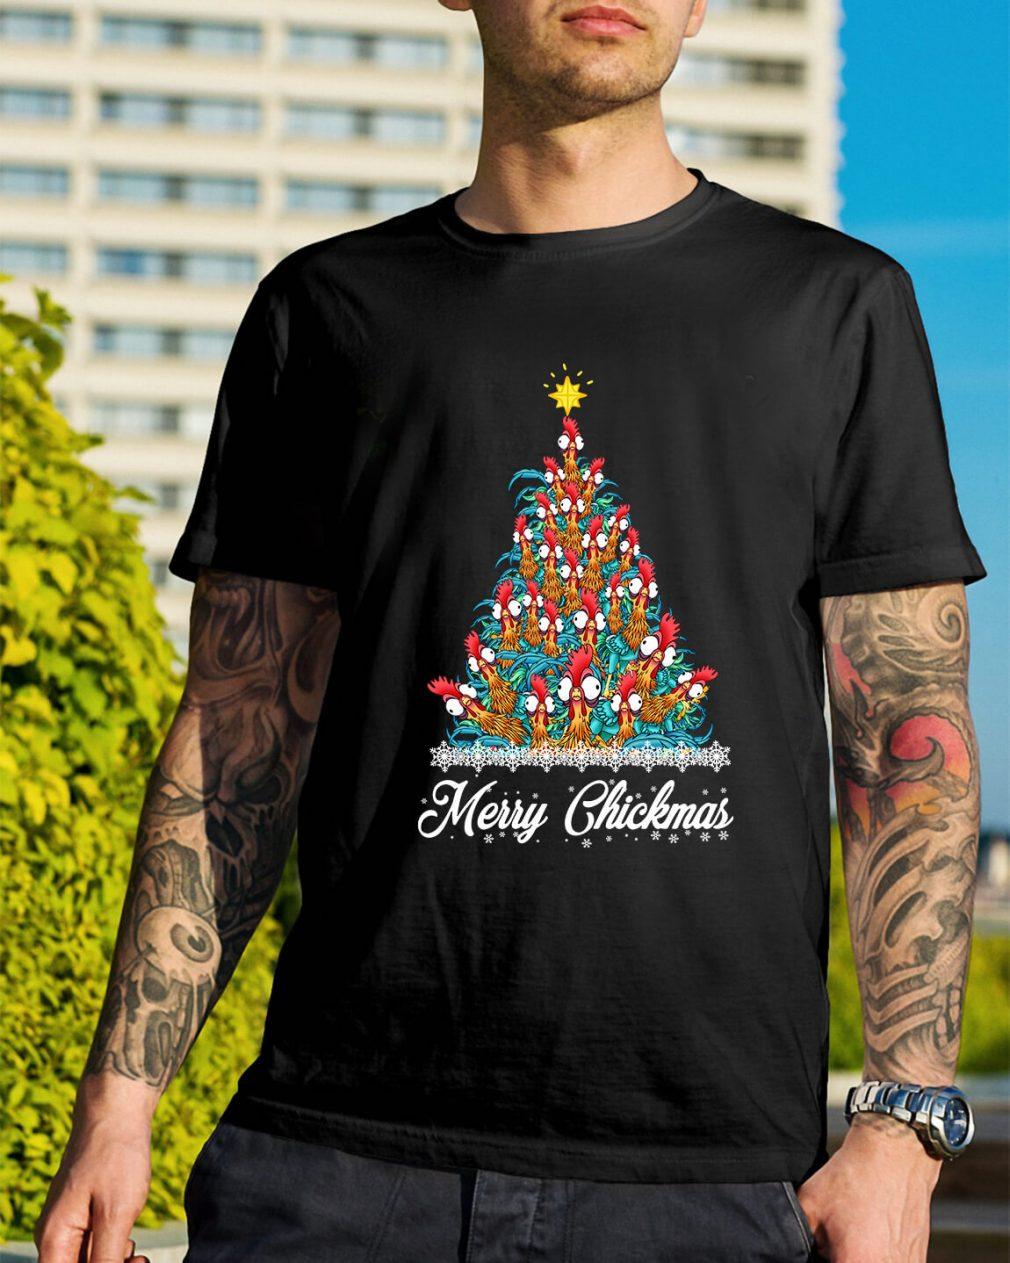 Merry Chickmas Hei Hei tree Guys Shirt